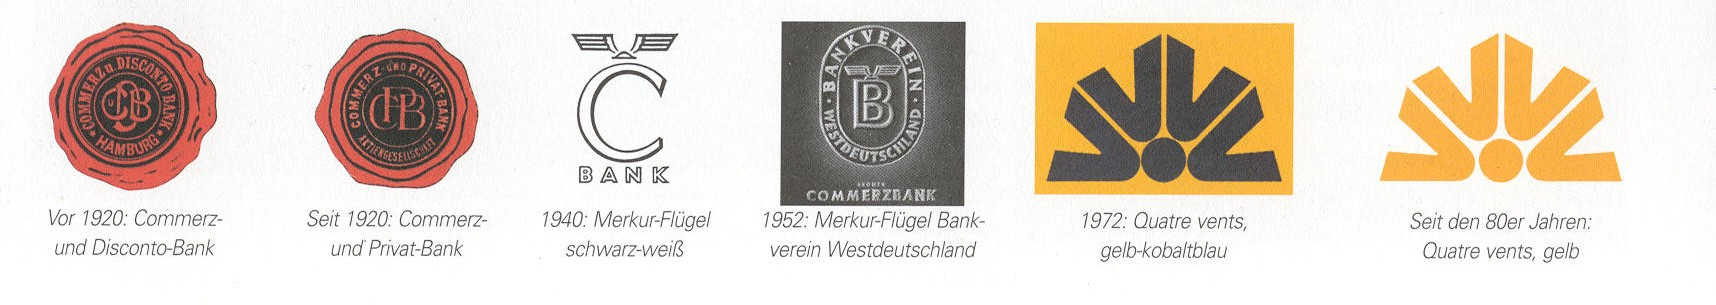 Commerzbank-Logo-Geschichte